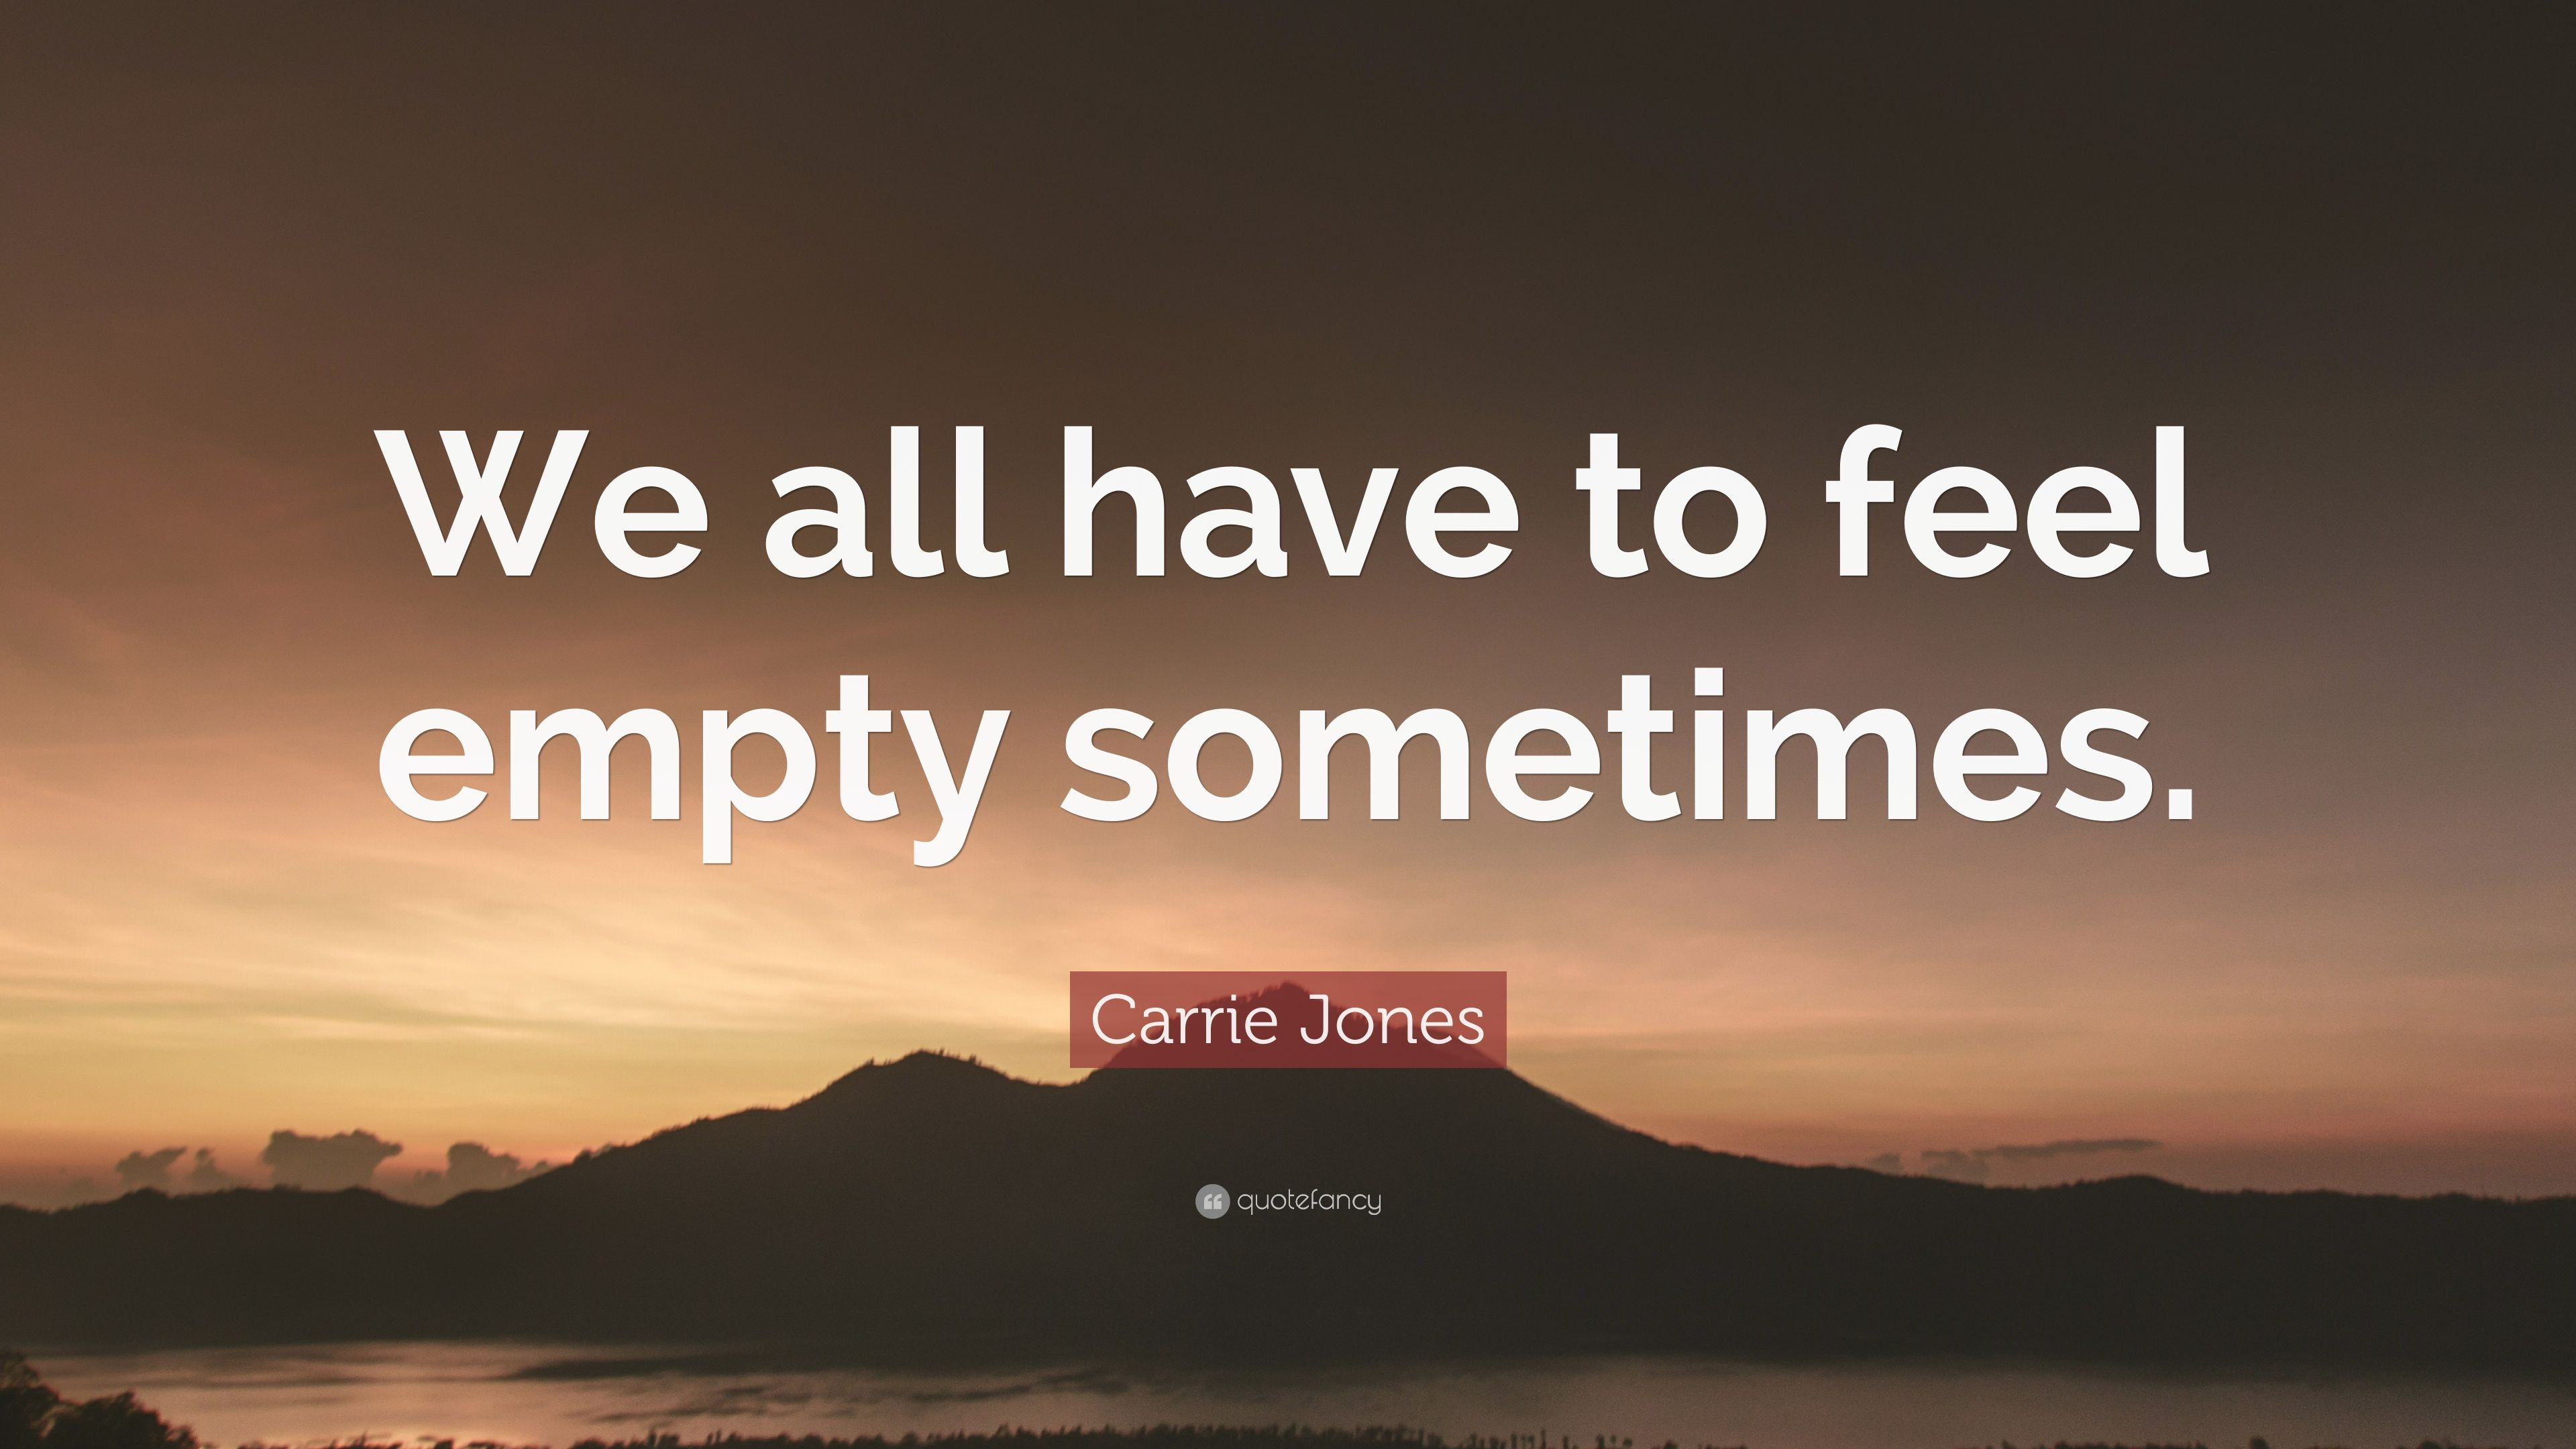 Carrie jones quote we all have to feel empty sometimes 10 carrie jones quote we all have to feel empty sometimes altavistaventures Images